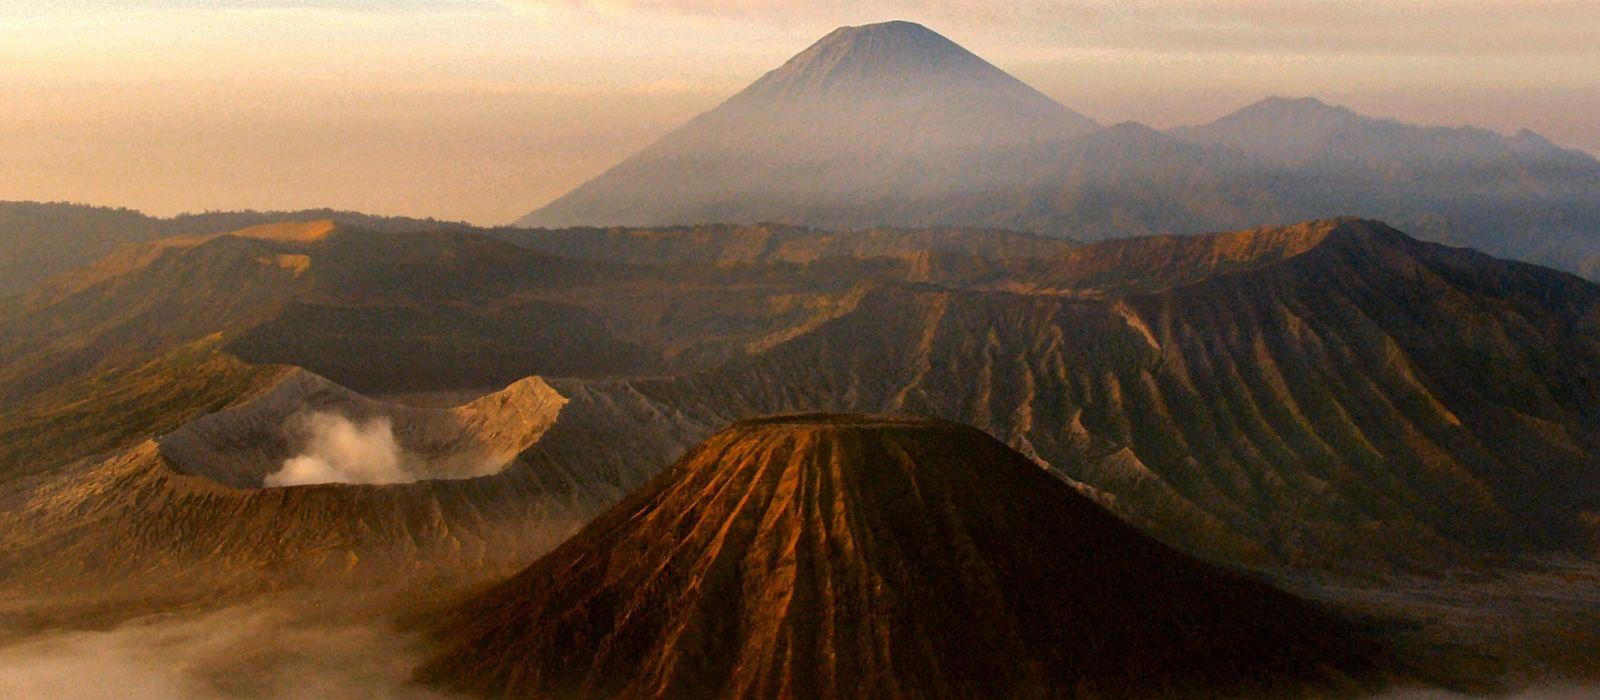 Festive Special: Indonesia's Timeless Landscapes and Unique Culture Tour Trip 4